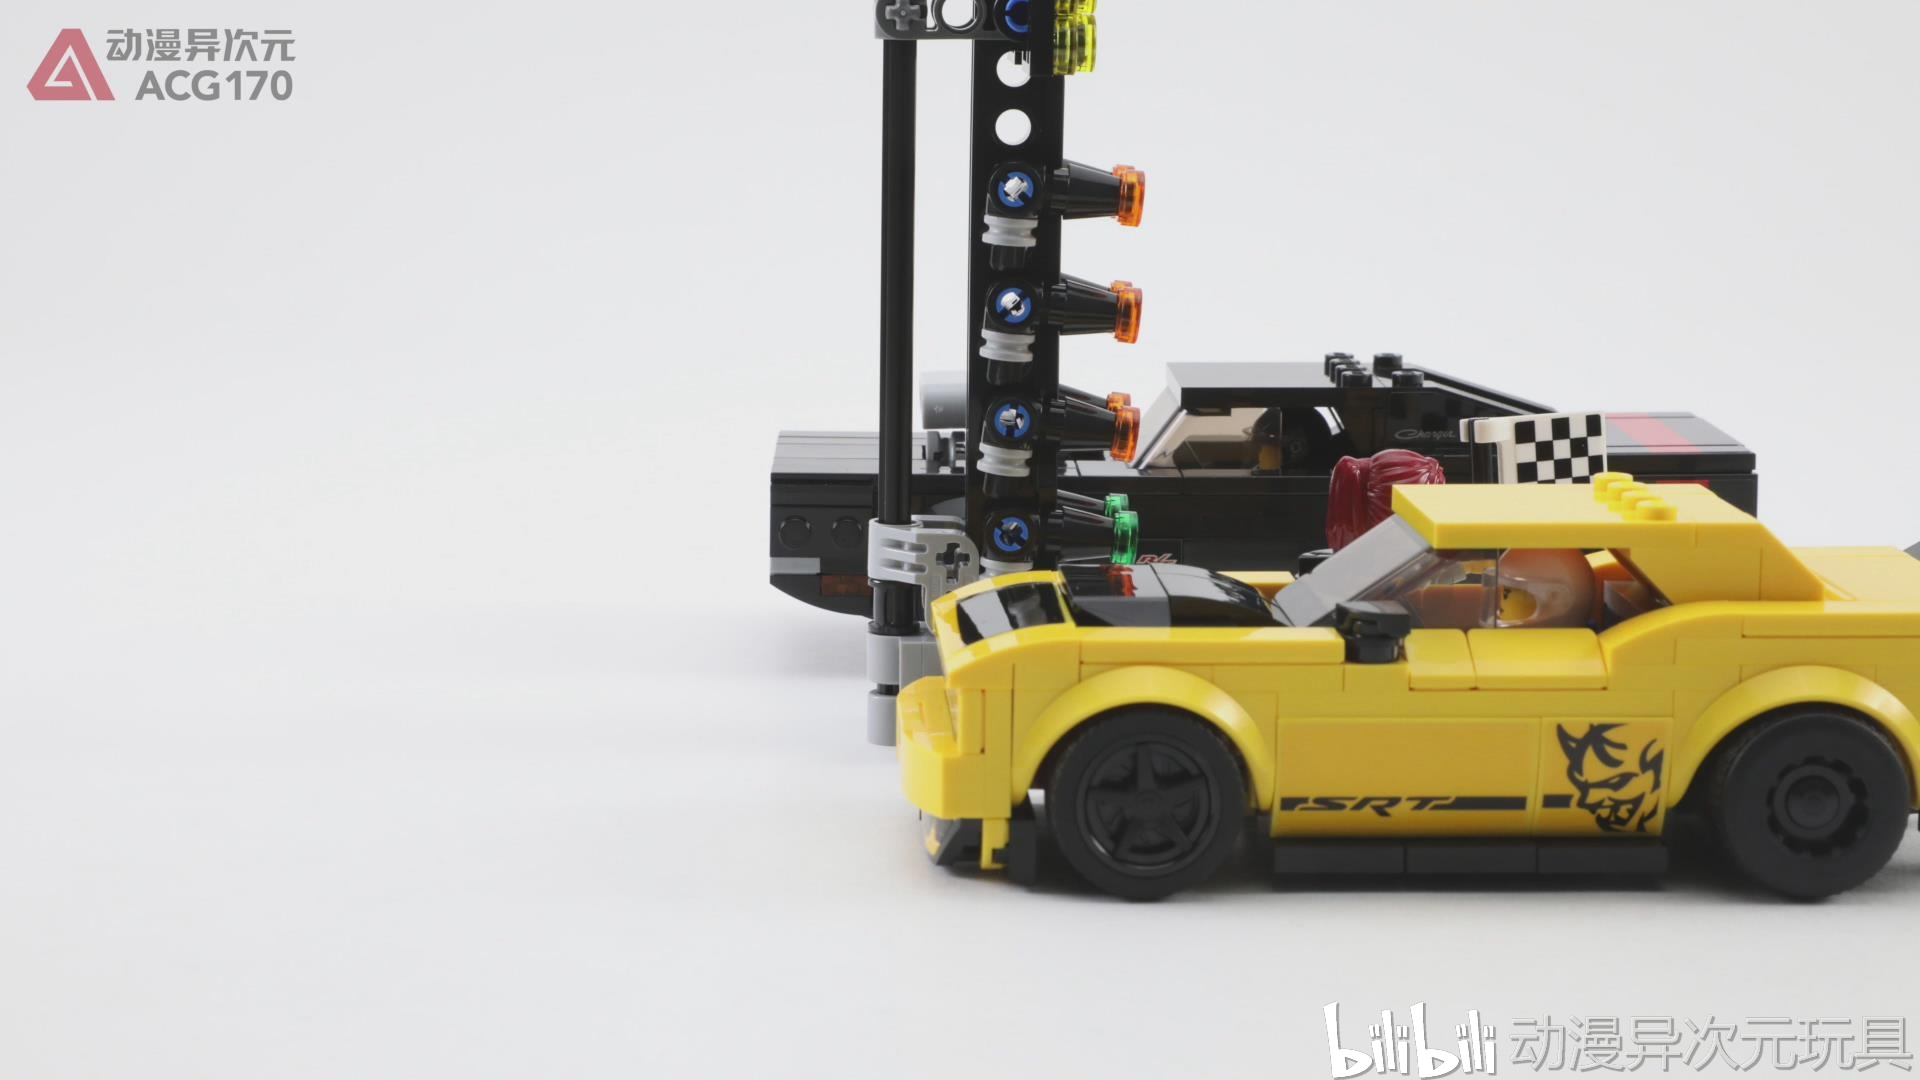 rt干哥哥_眼看就到终点了,驾驶员小哥哥将发动机增压器的输出开到最大,展开最后